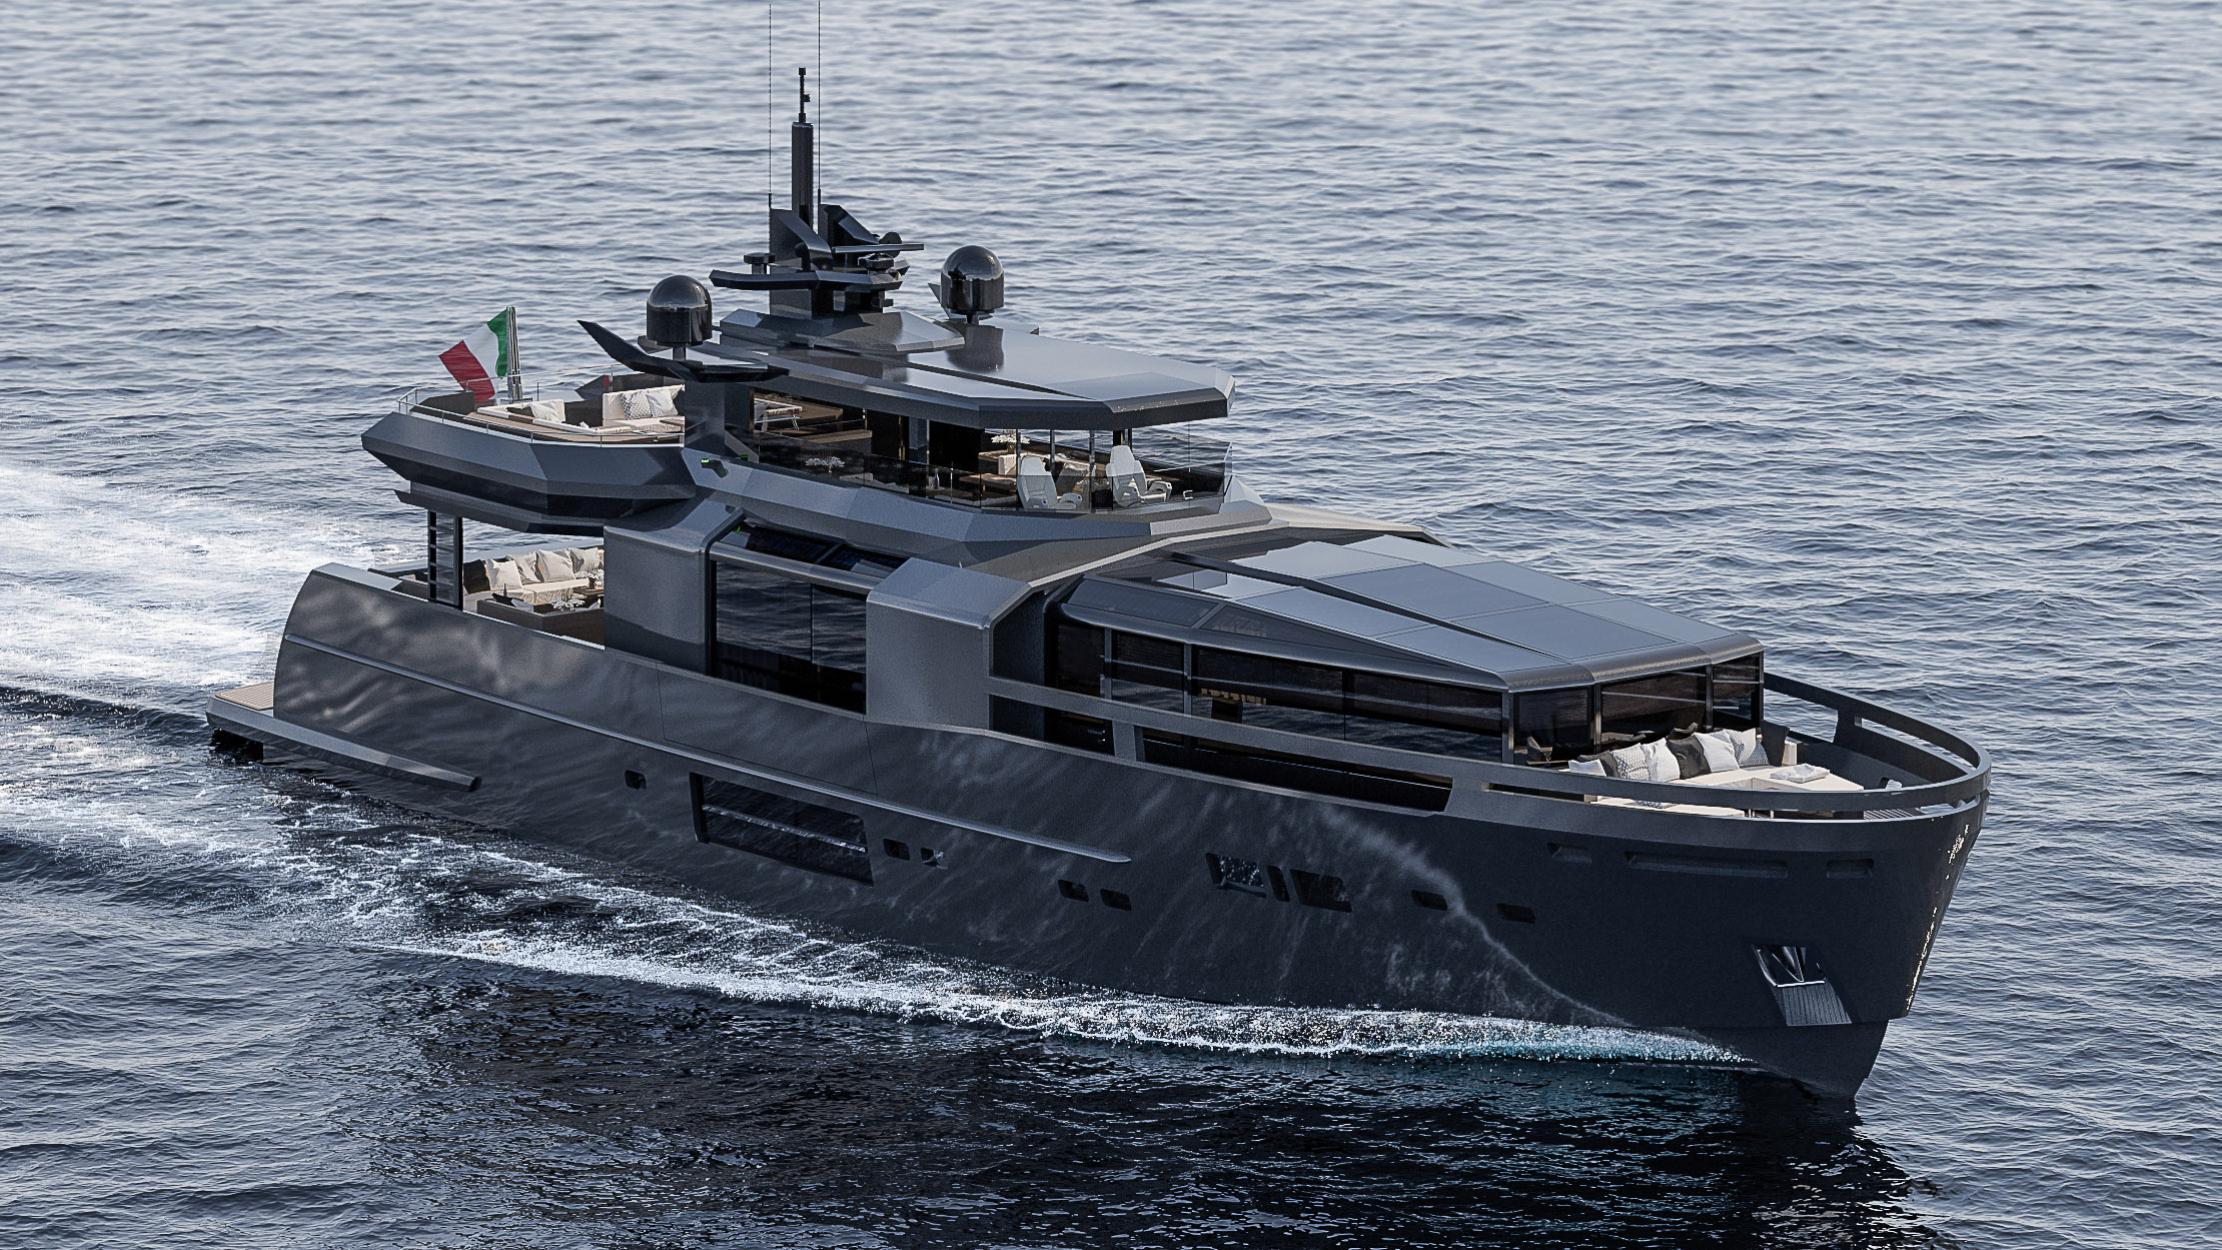 rj arcadia 105 motoryacht arcadia yachts 31m 2018 rendering